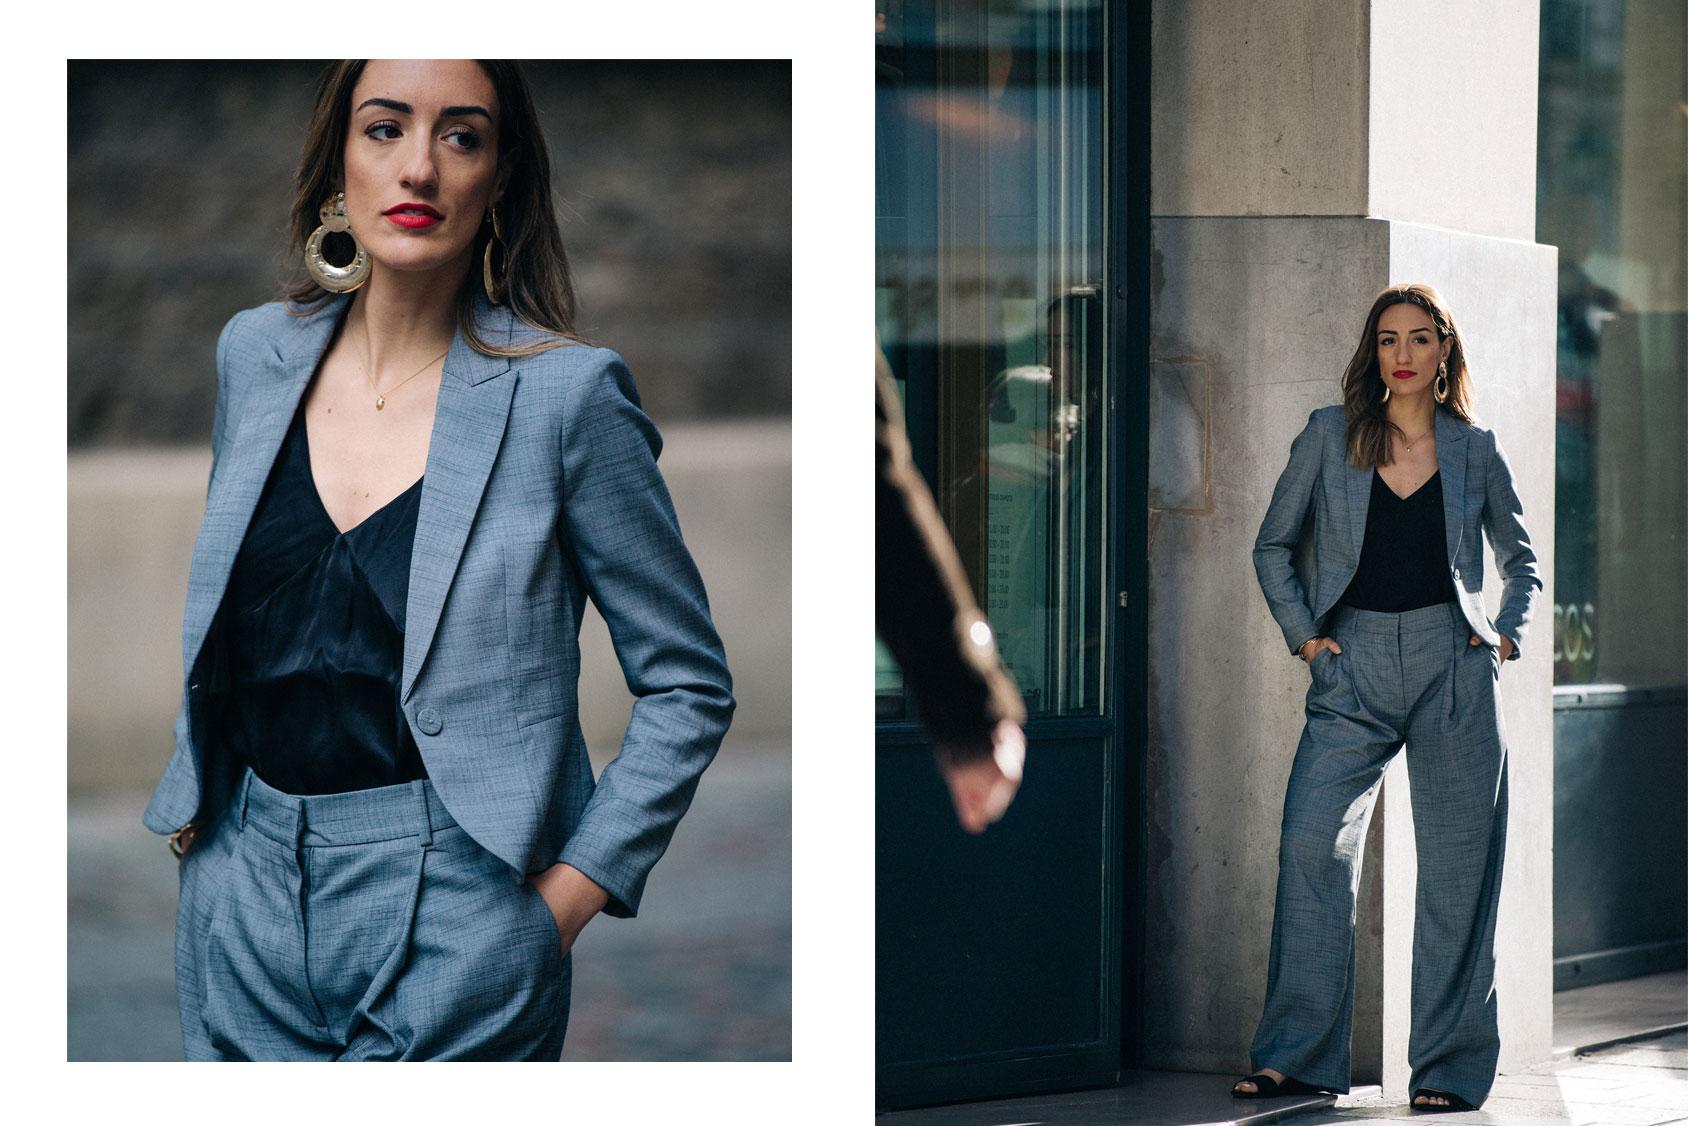 Kenza Sadoun El Glaoui in H&M suit